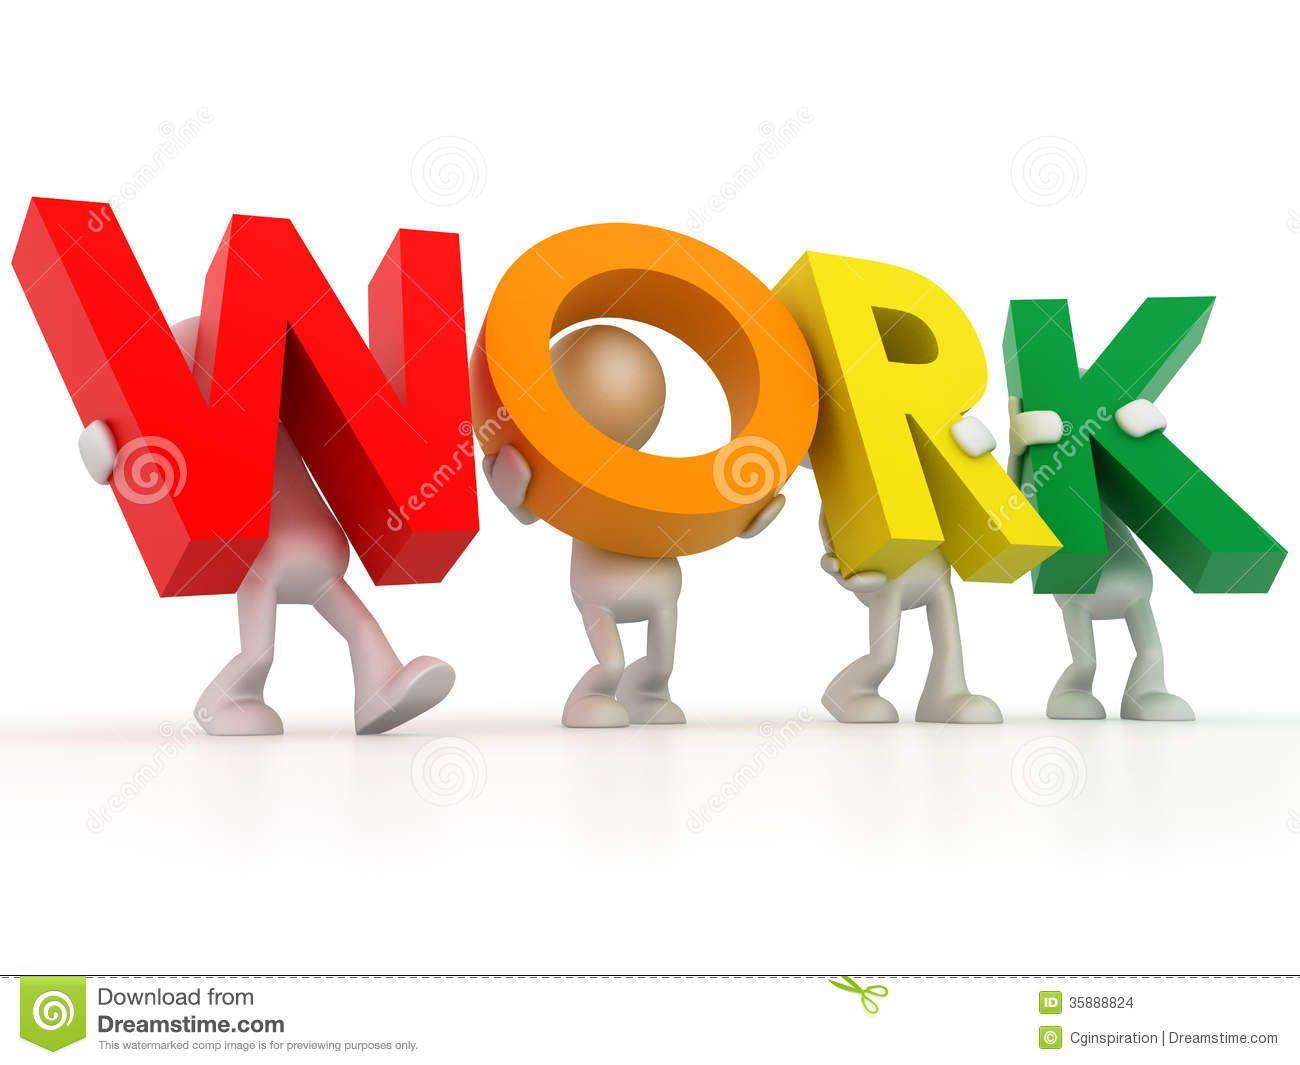 Word clipart word work Work Image: Word Clip Work